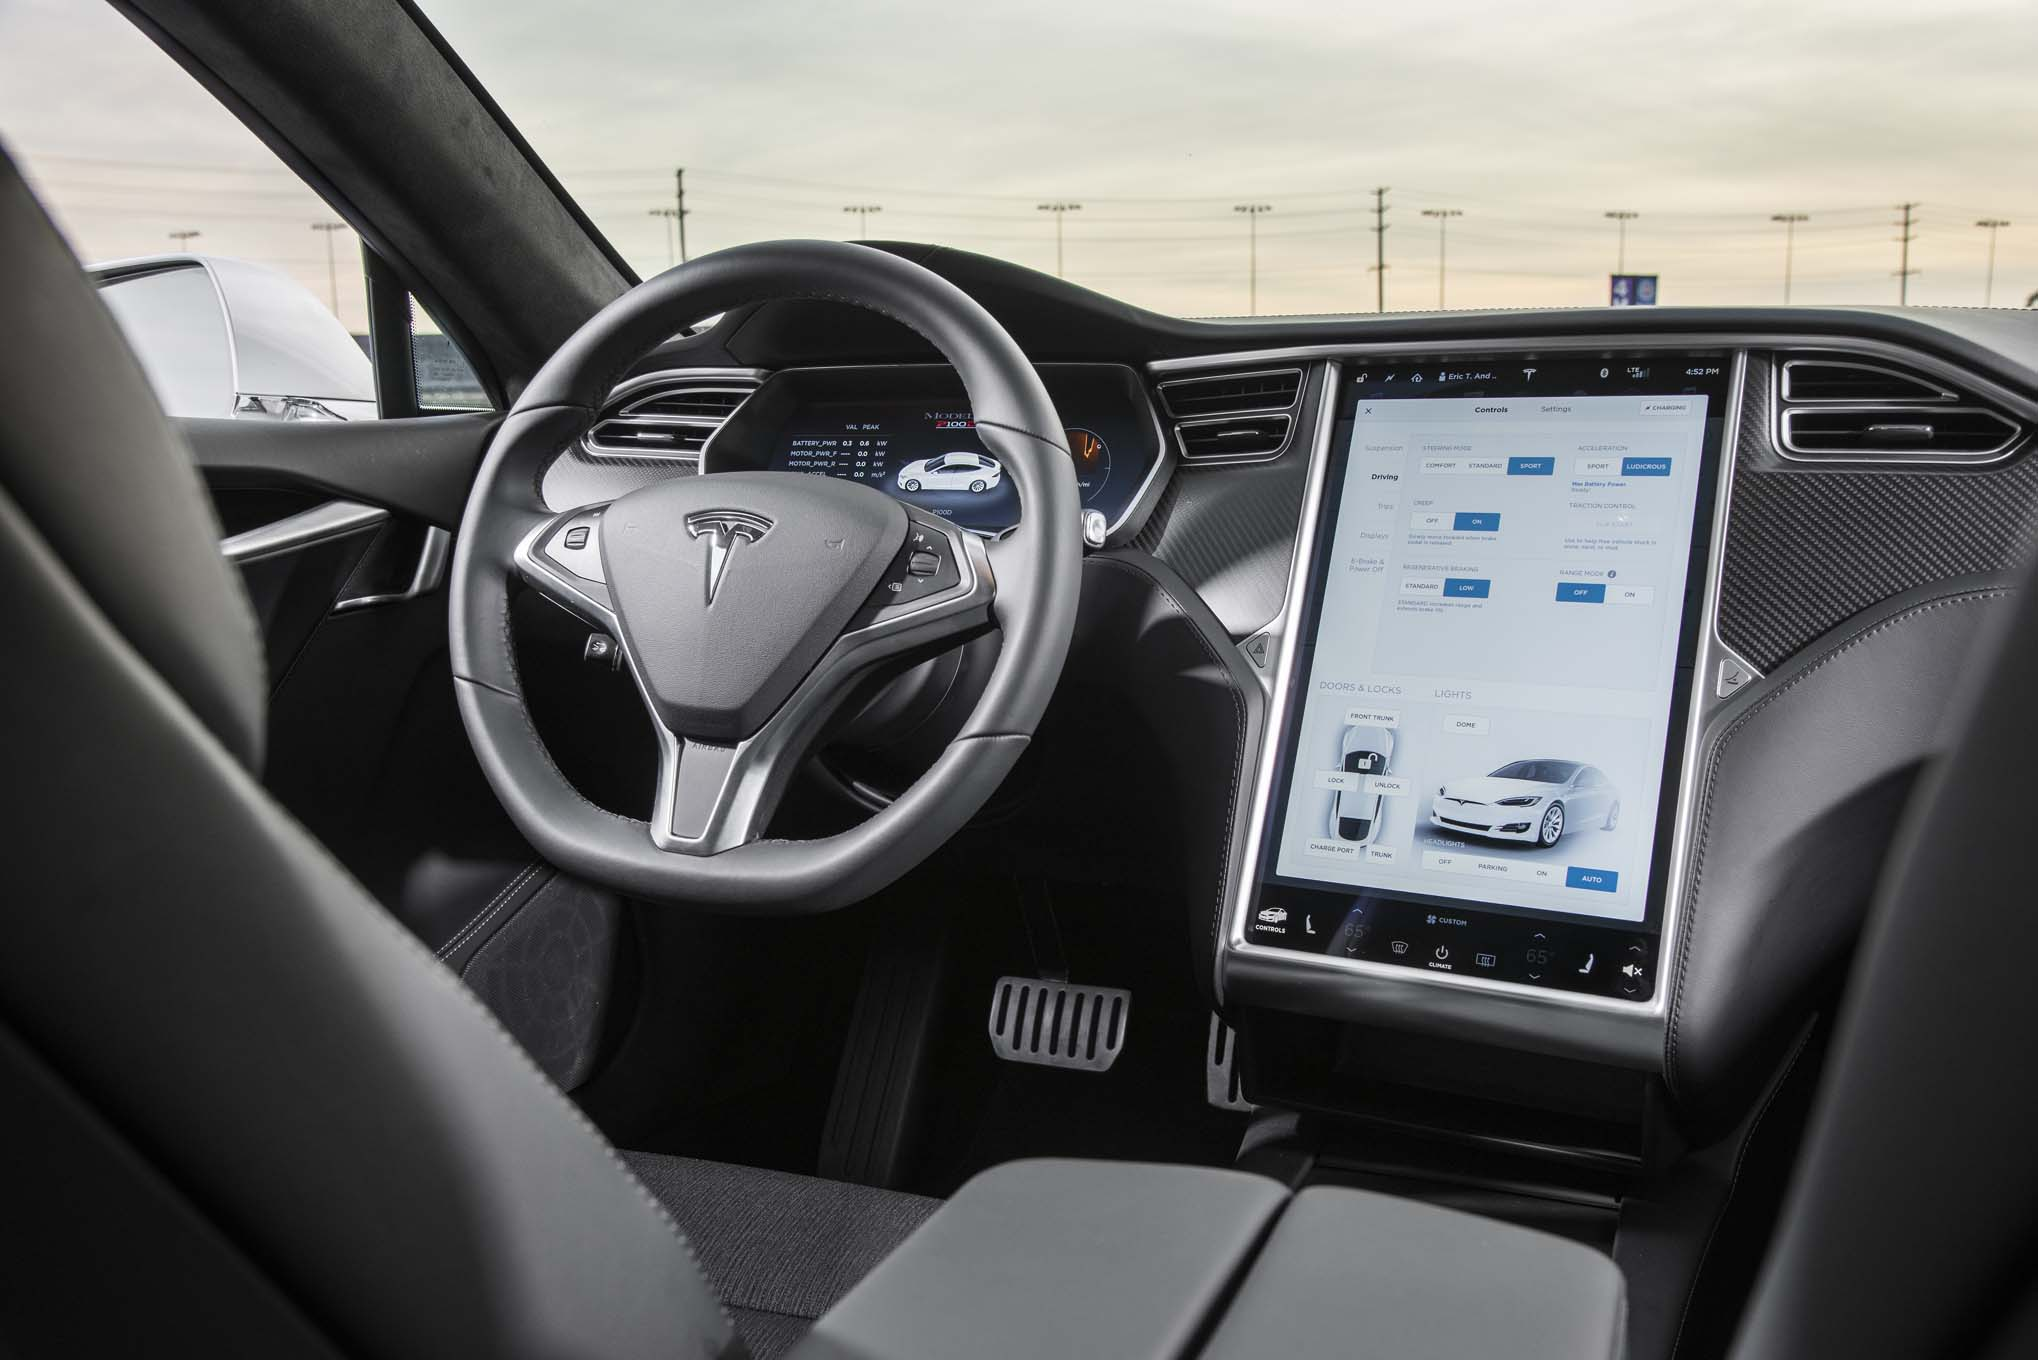 2017 Tesla Model S P100d Interior 02